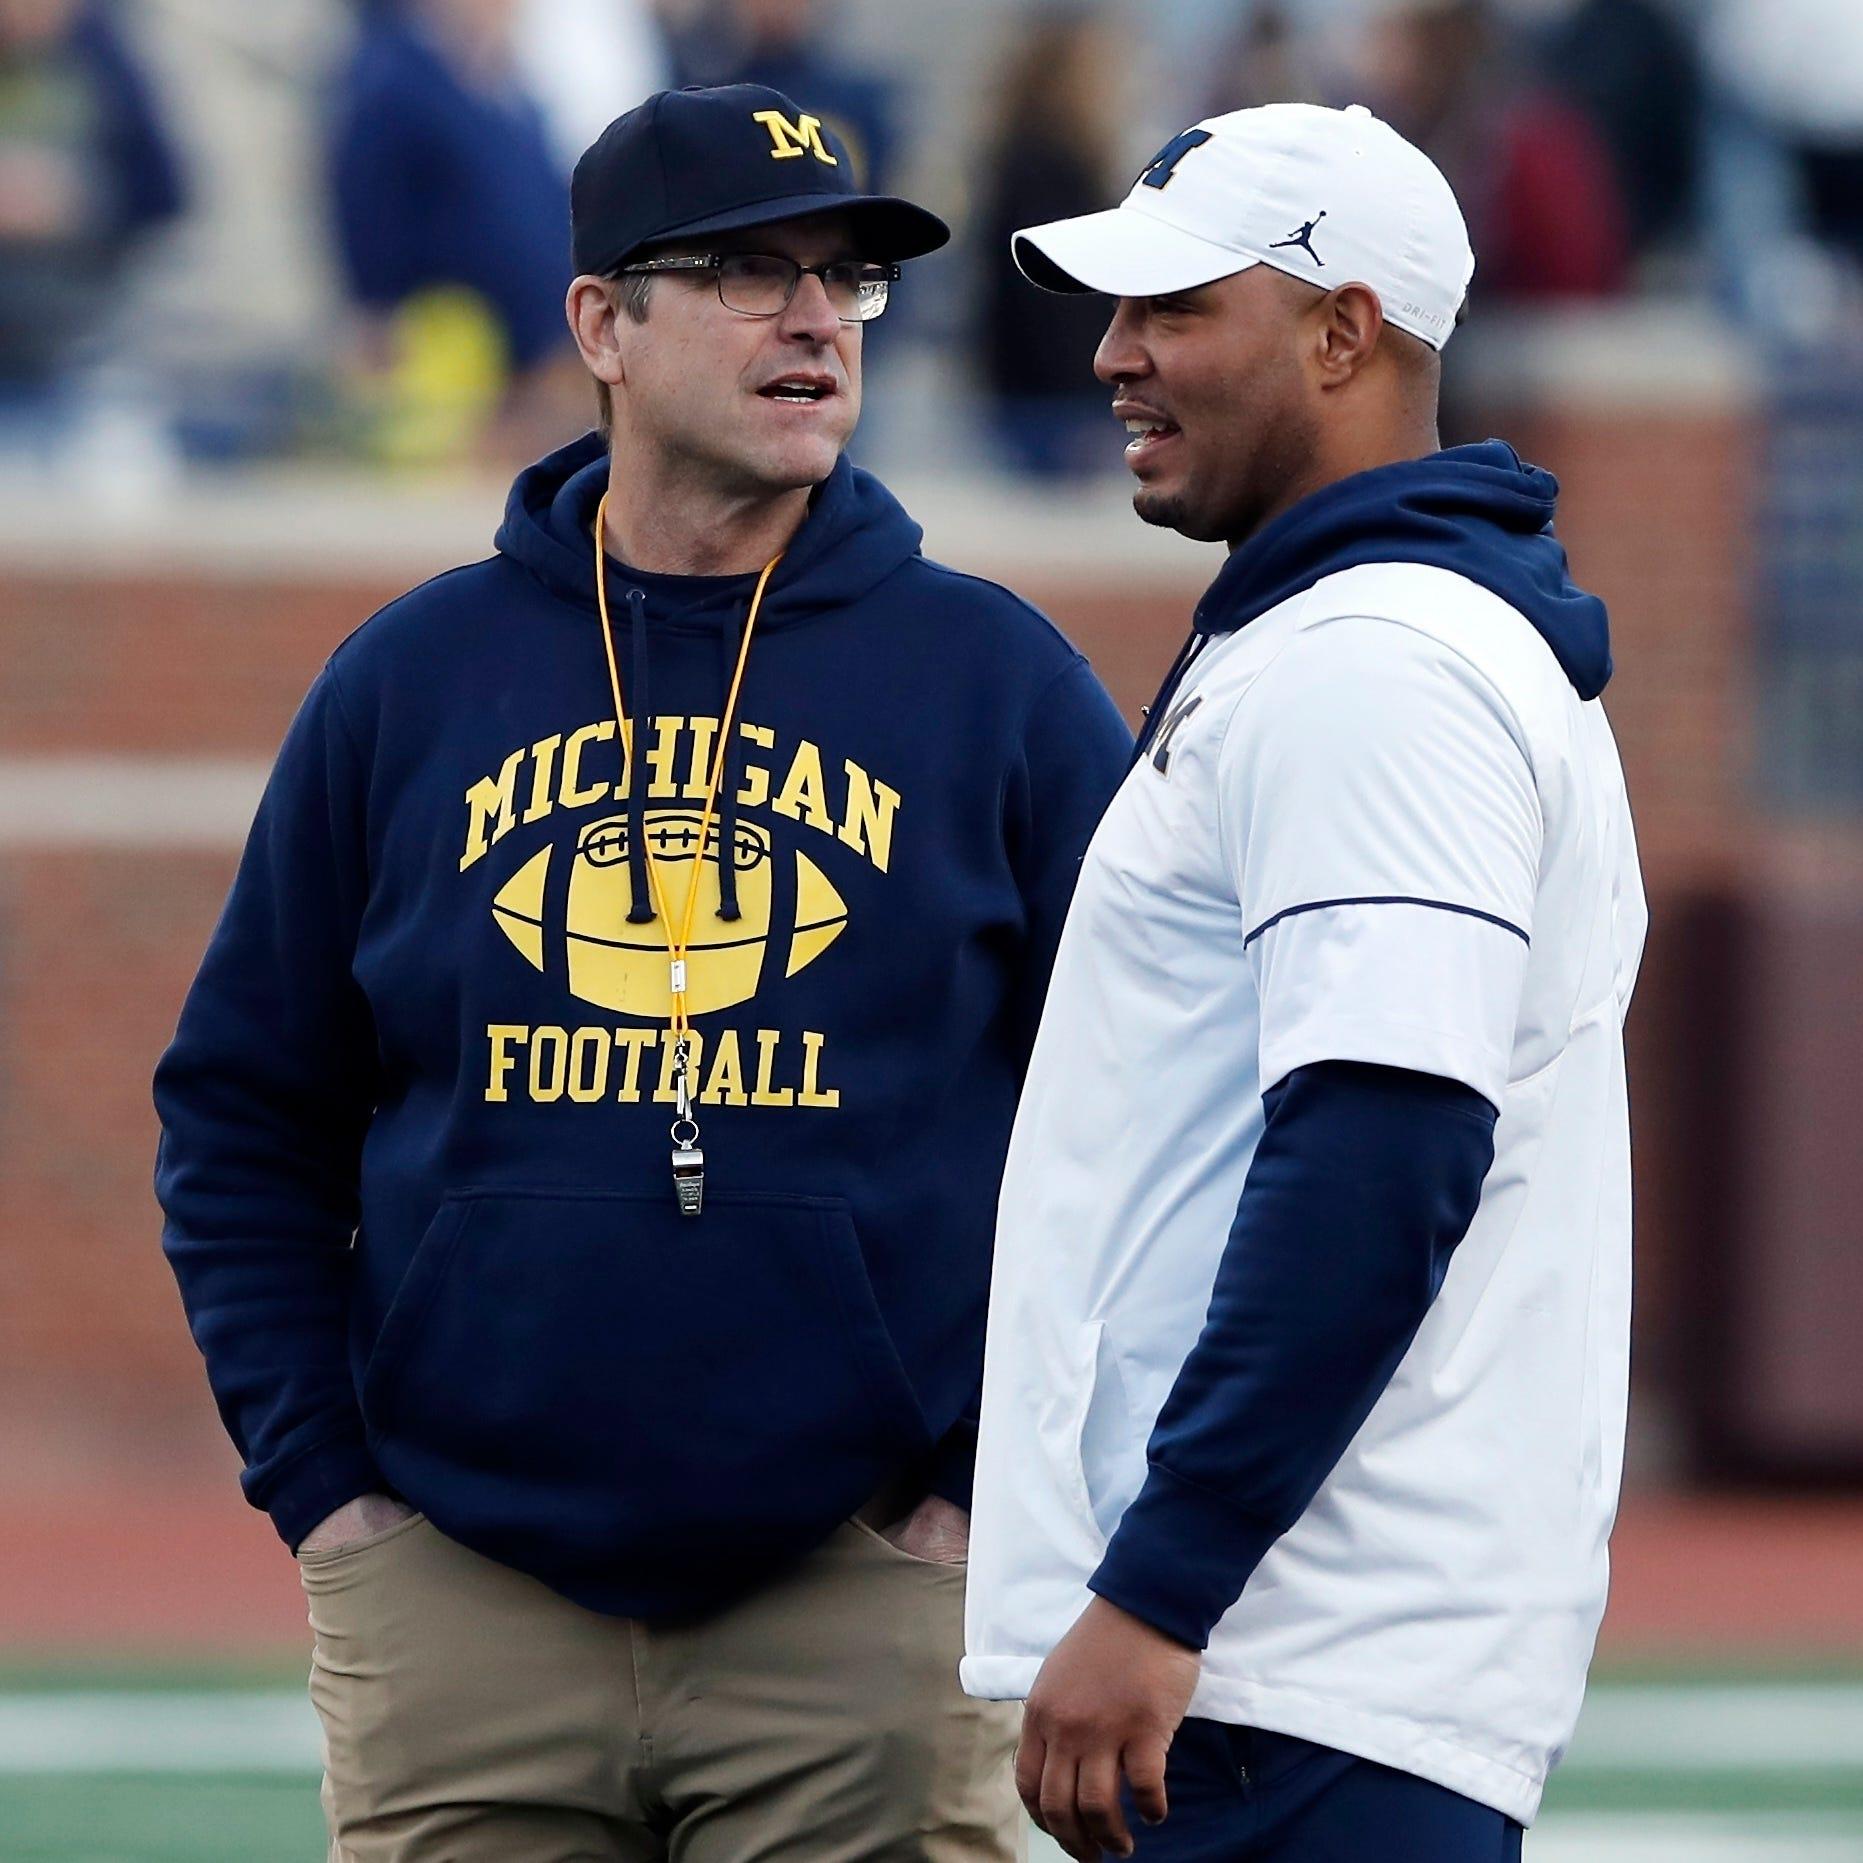 Michigan football film study: First glimpse at Josh Gattis' offense